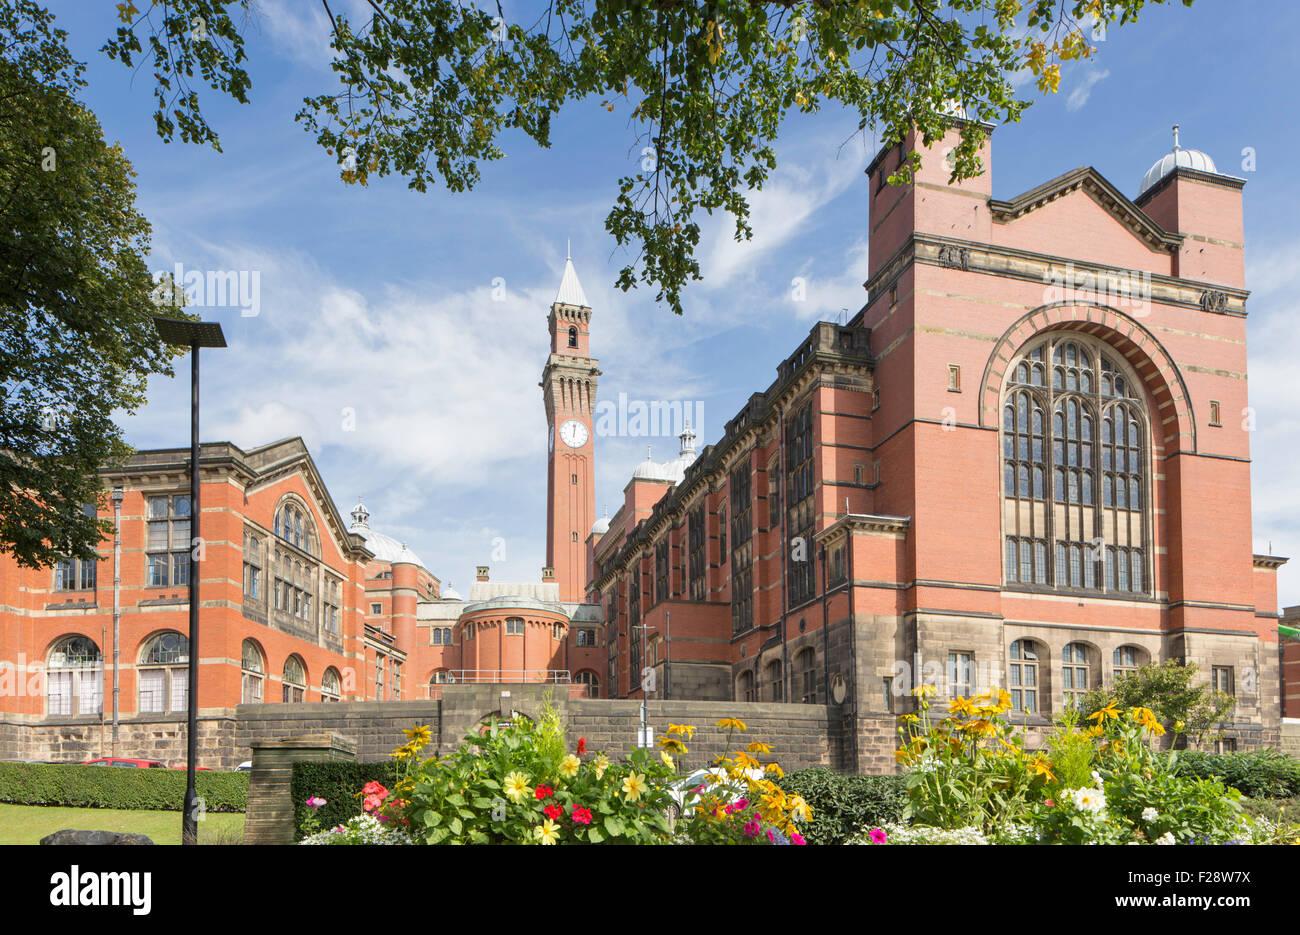 Chancellor's Court and the Joseph Chamberlain Memorial Clock Tower, University of Birmingham, England, UK Stock Photo